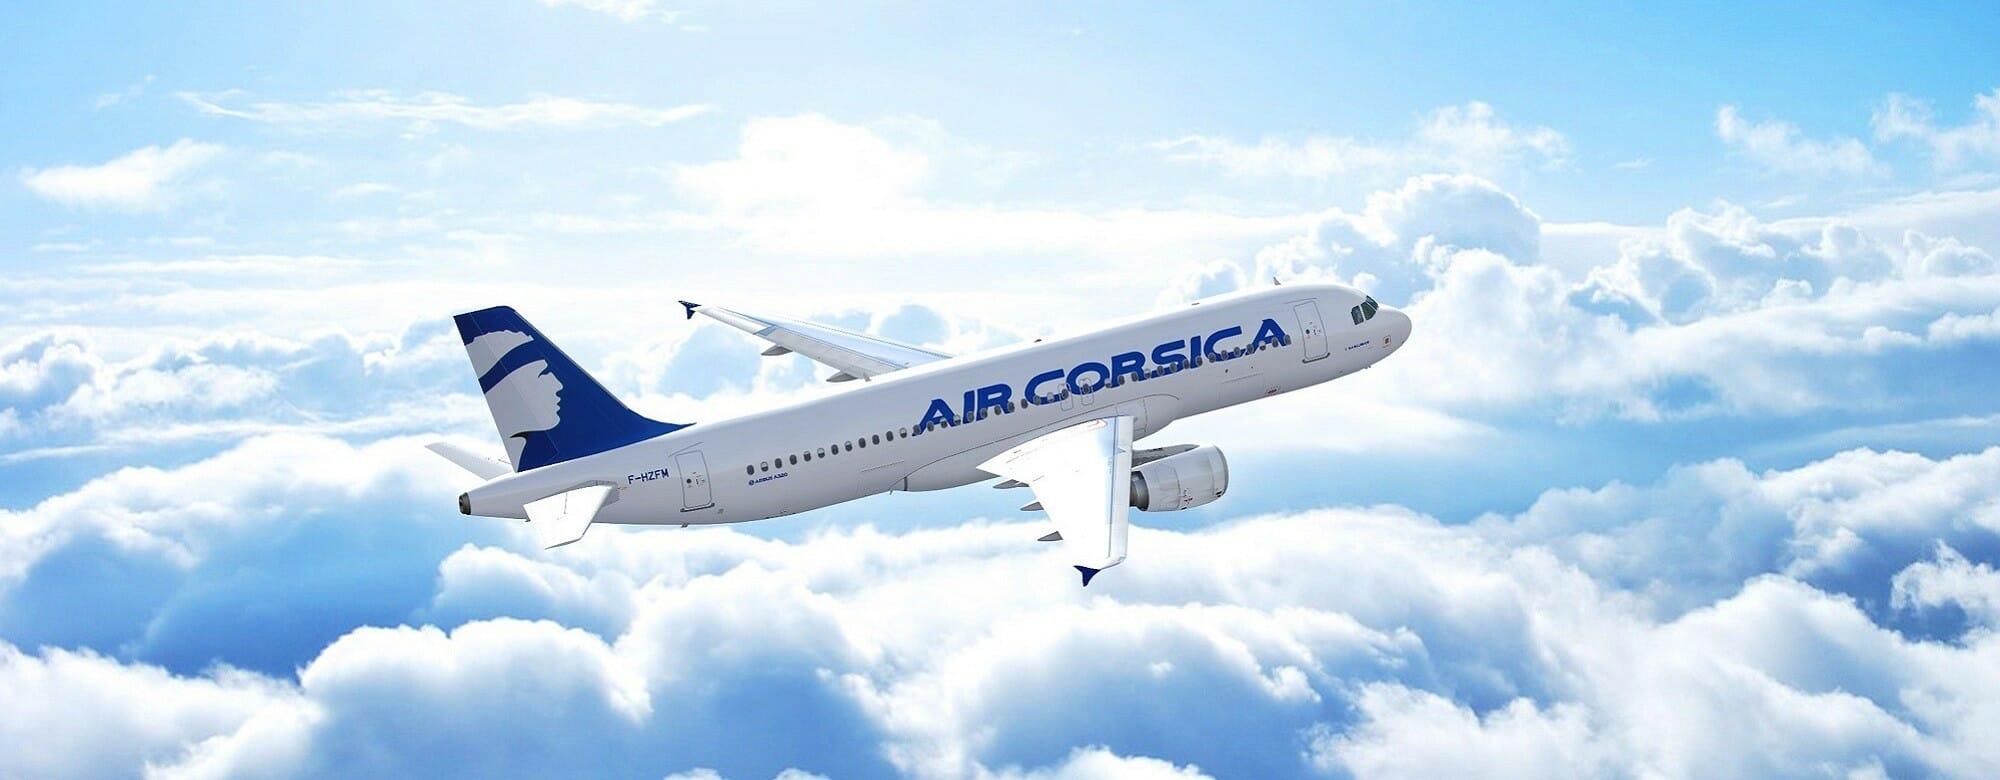 Corsica Flight Hotel